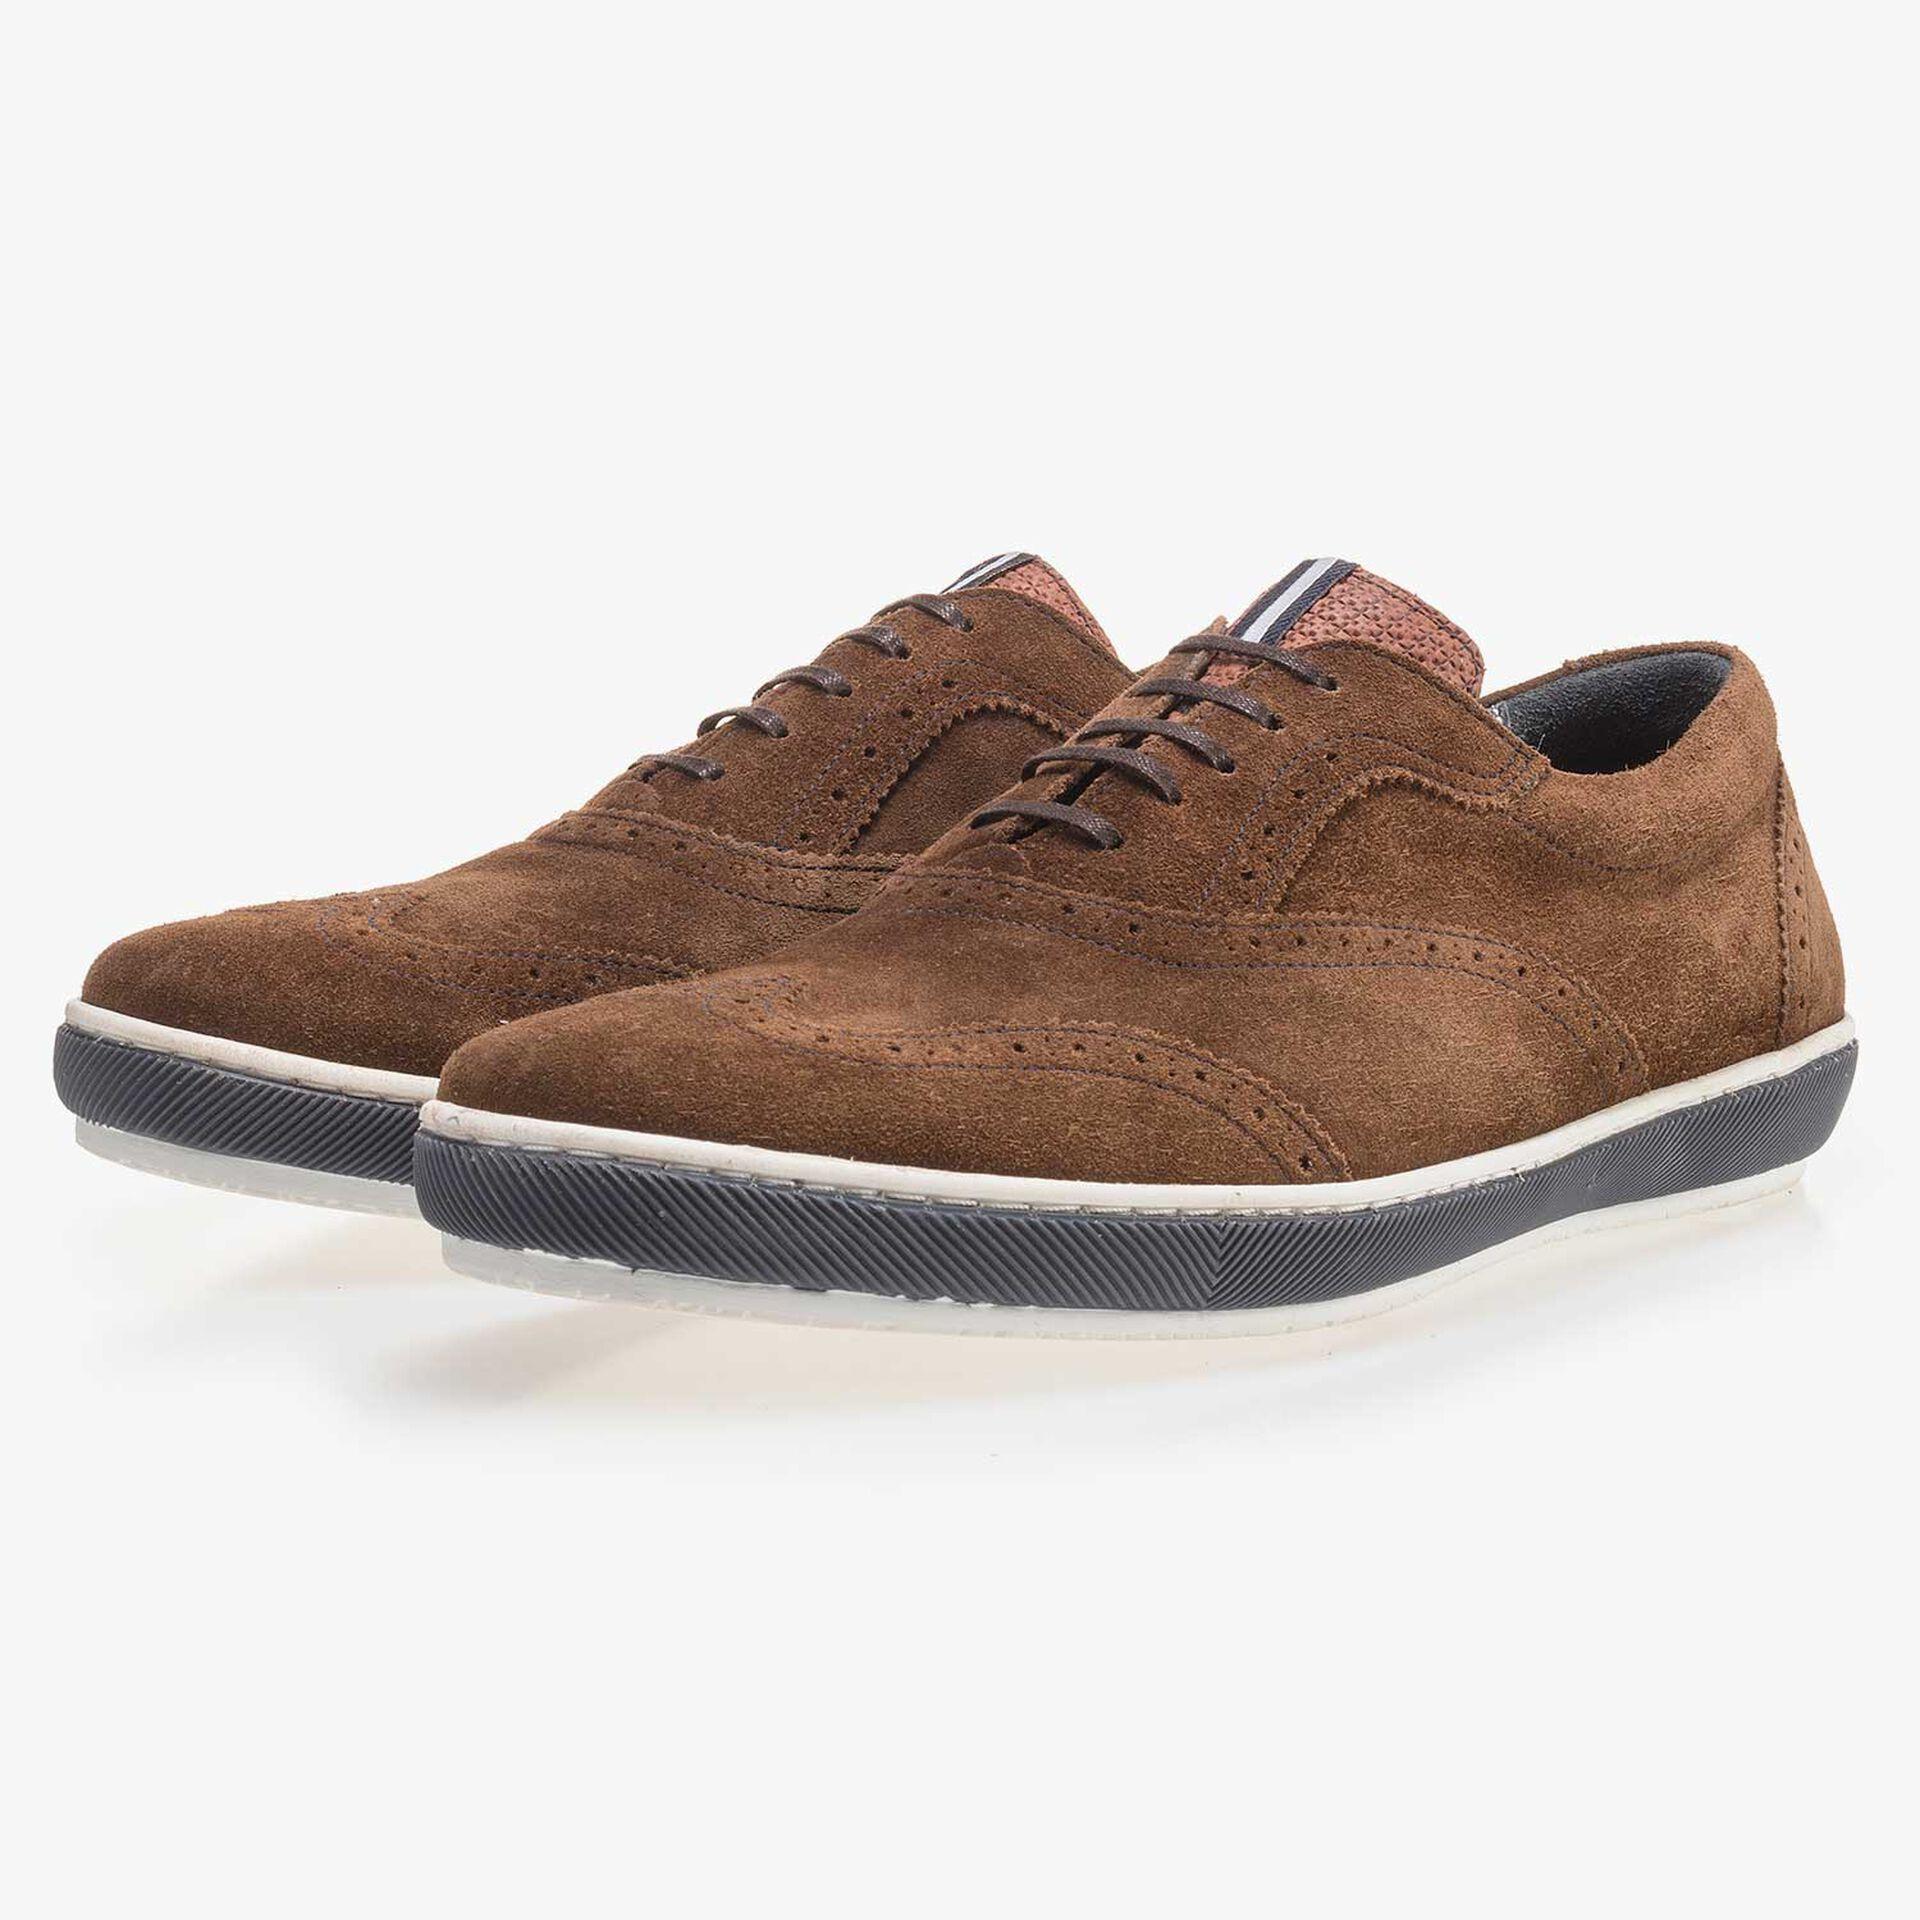 Bruine suède brogue sneaker